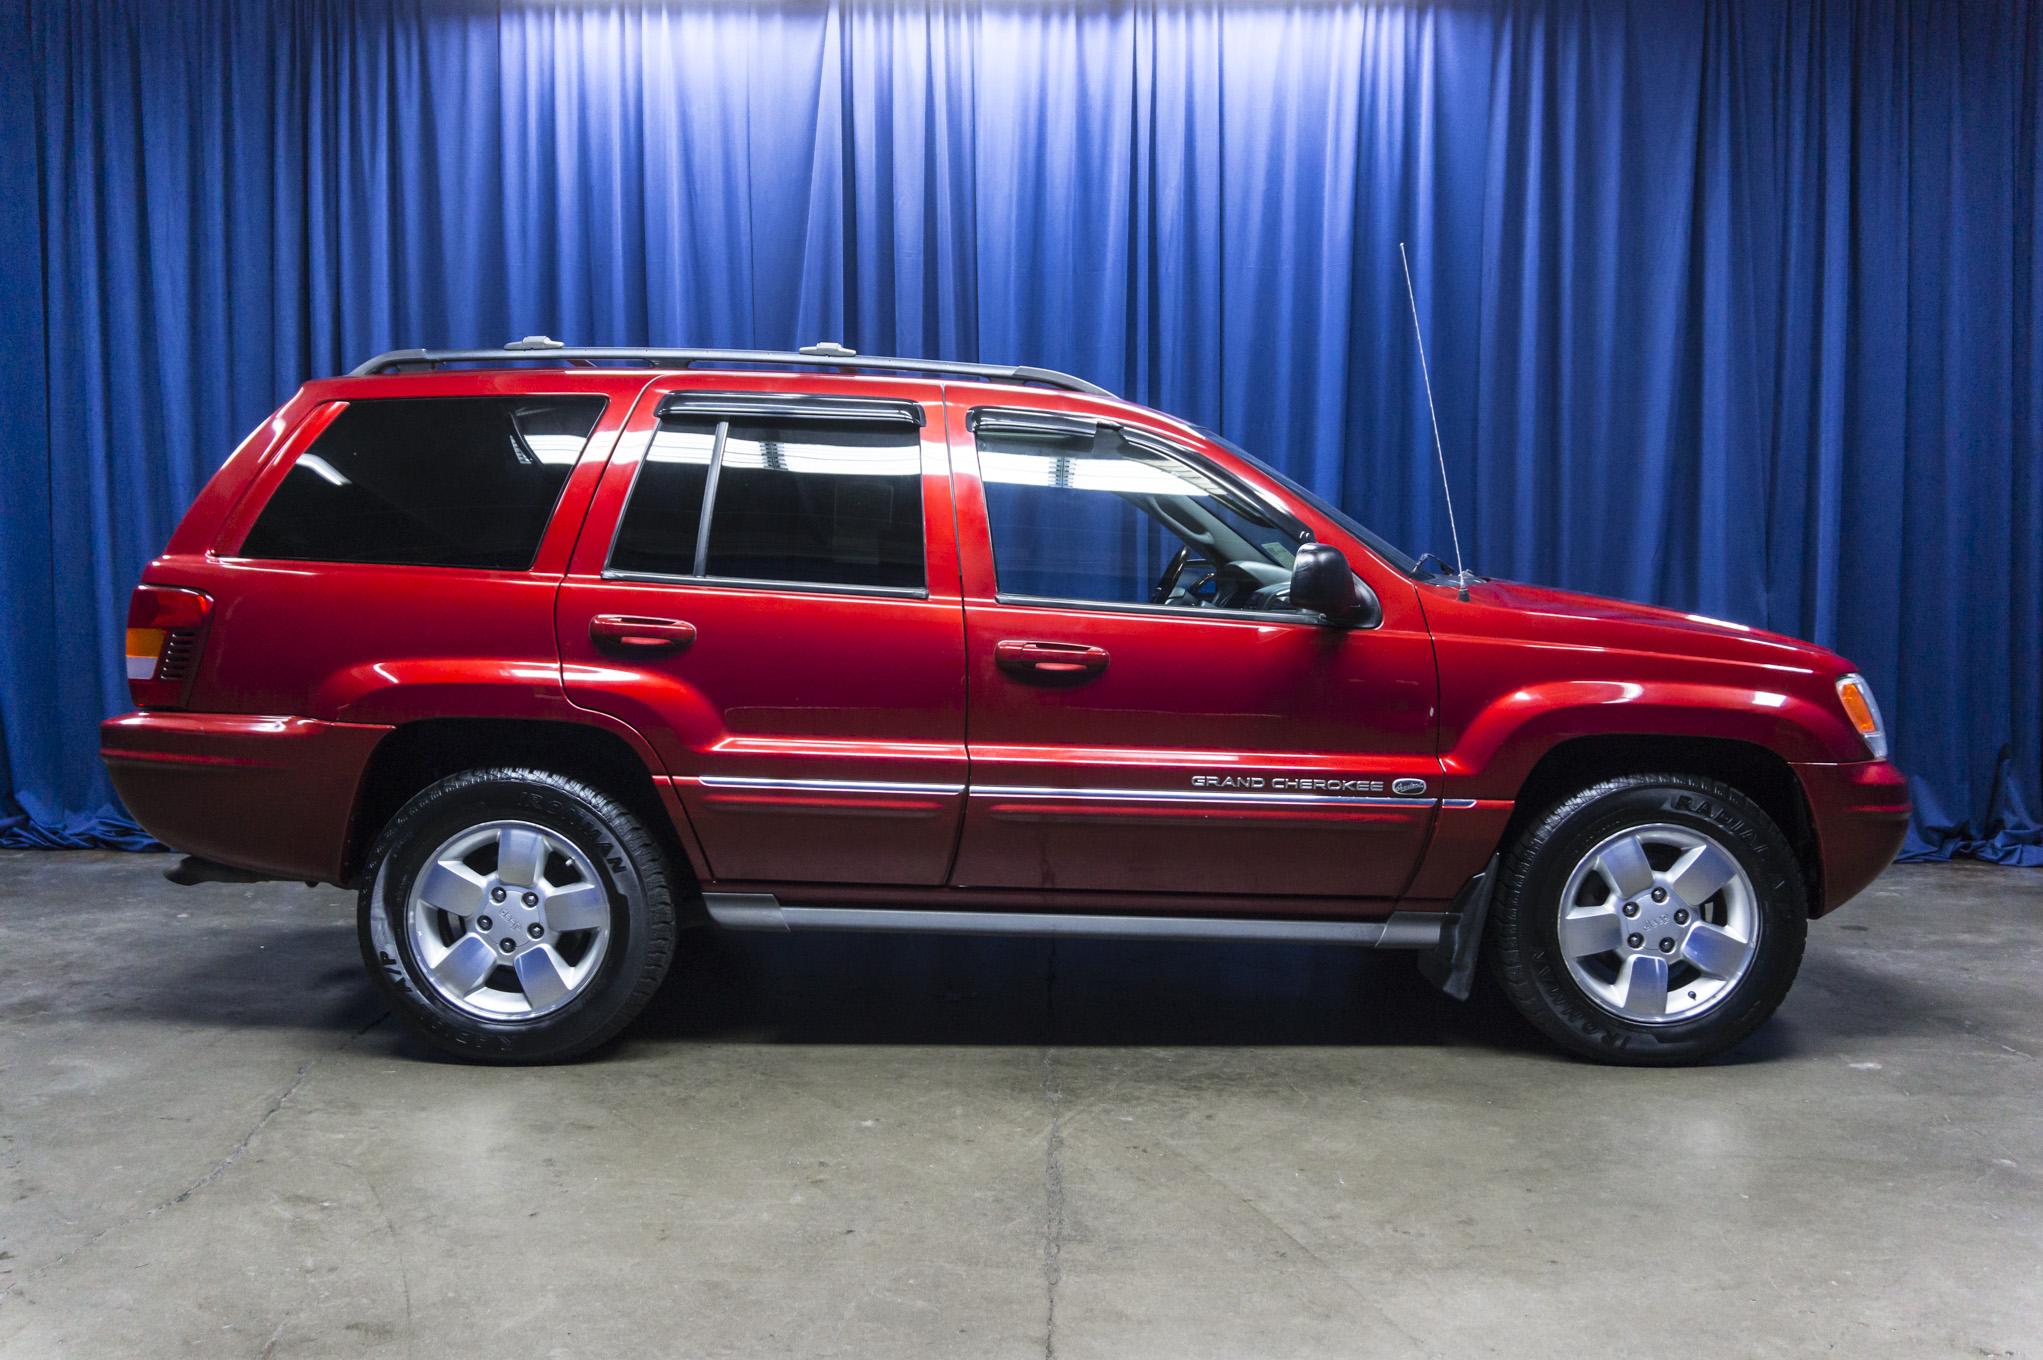 Used 2004 Jeep Grand Cherokee Overland 4x4 Suv For Sale Northwest Motorsport